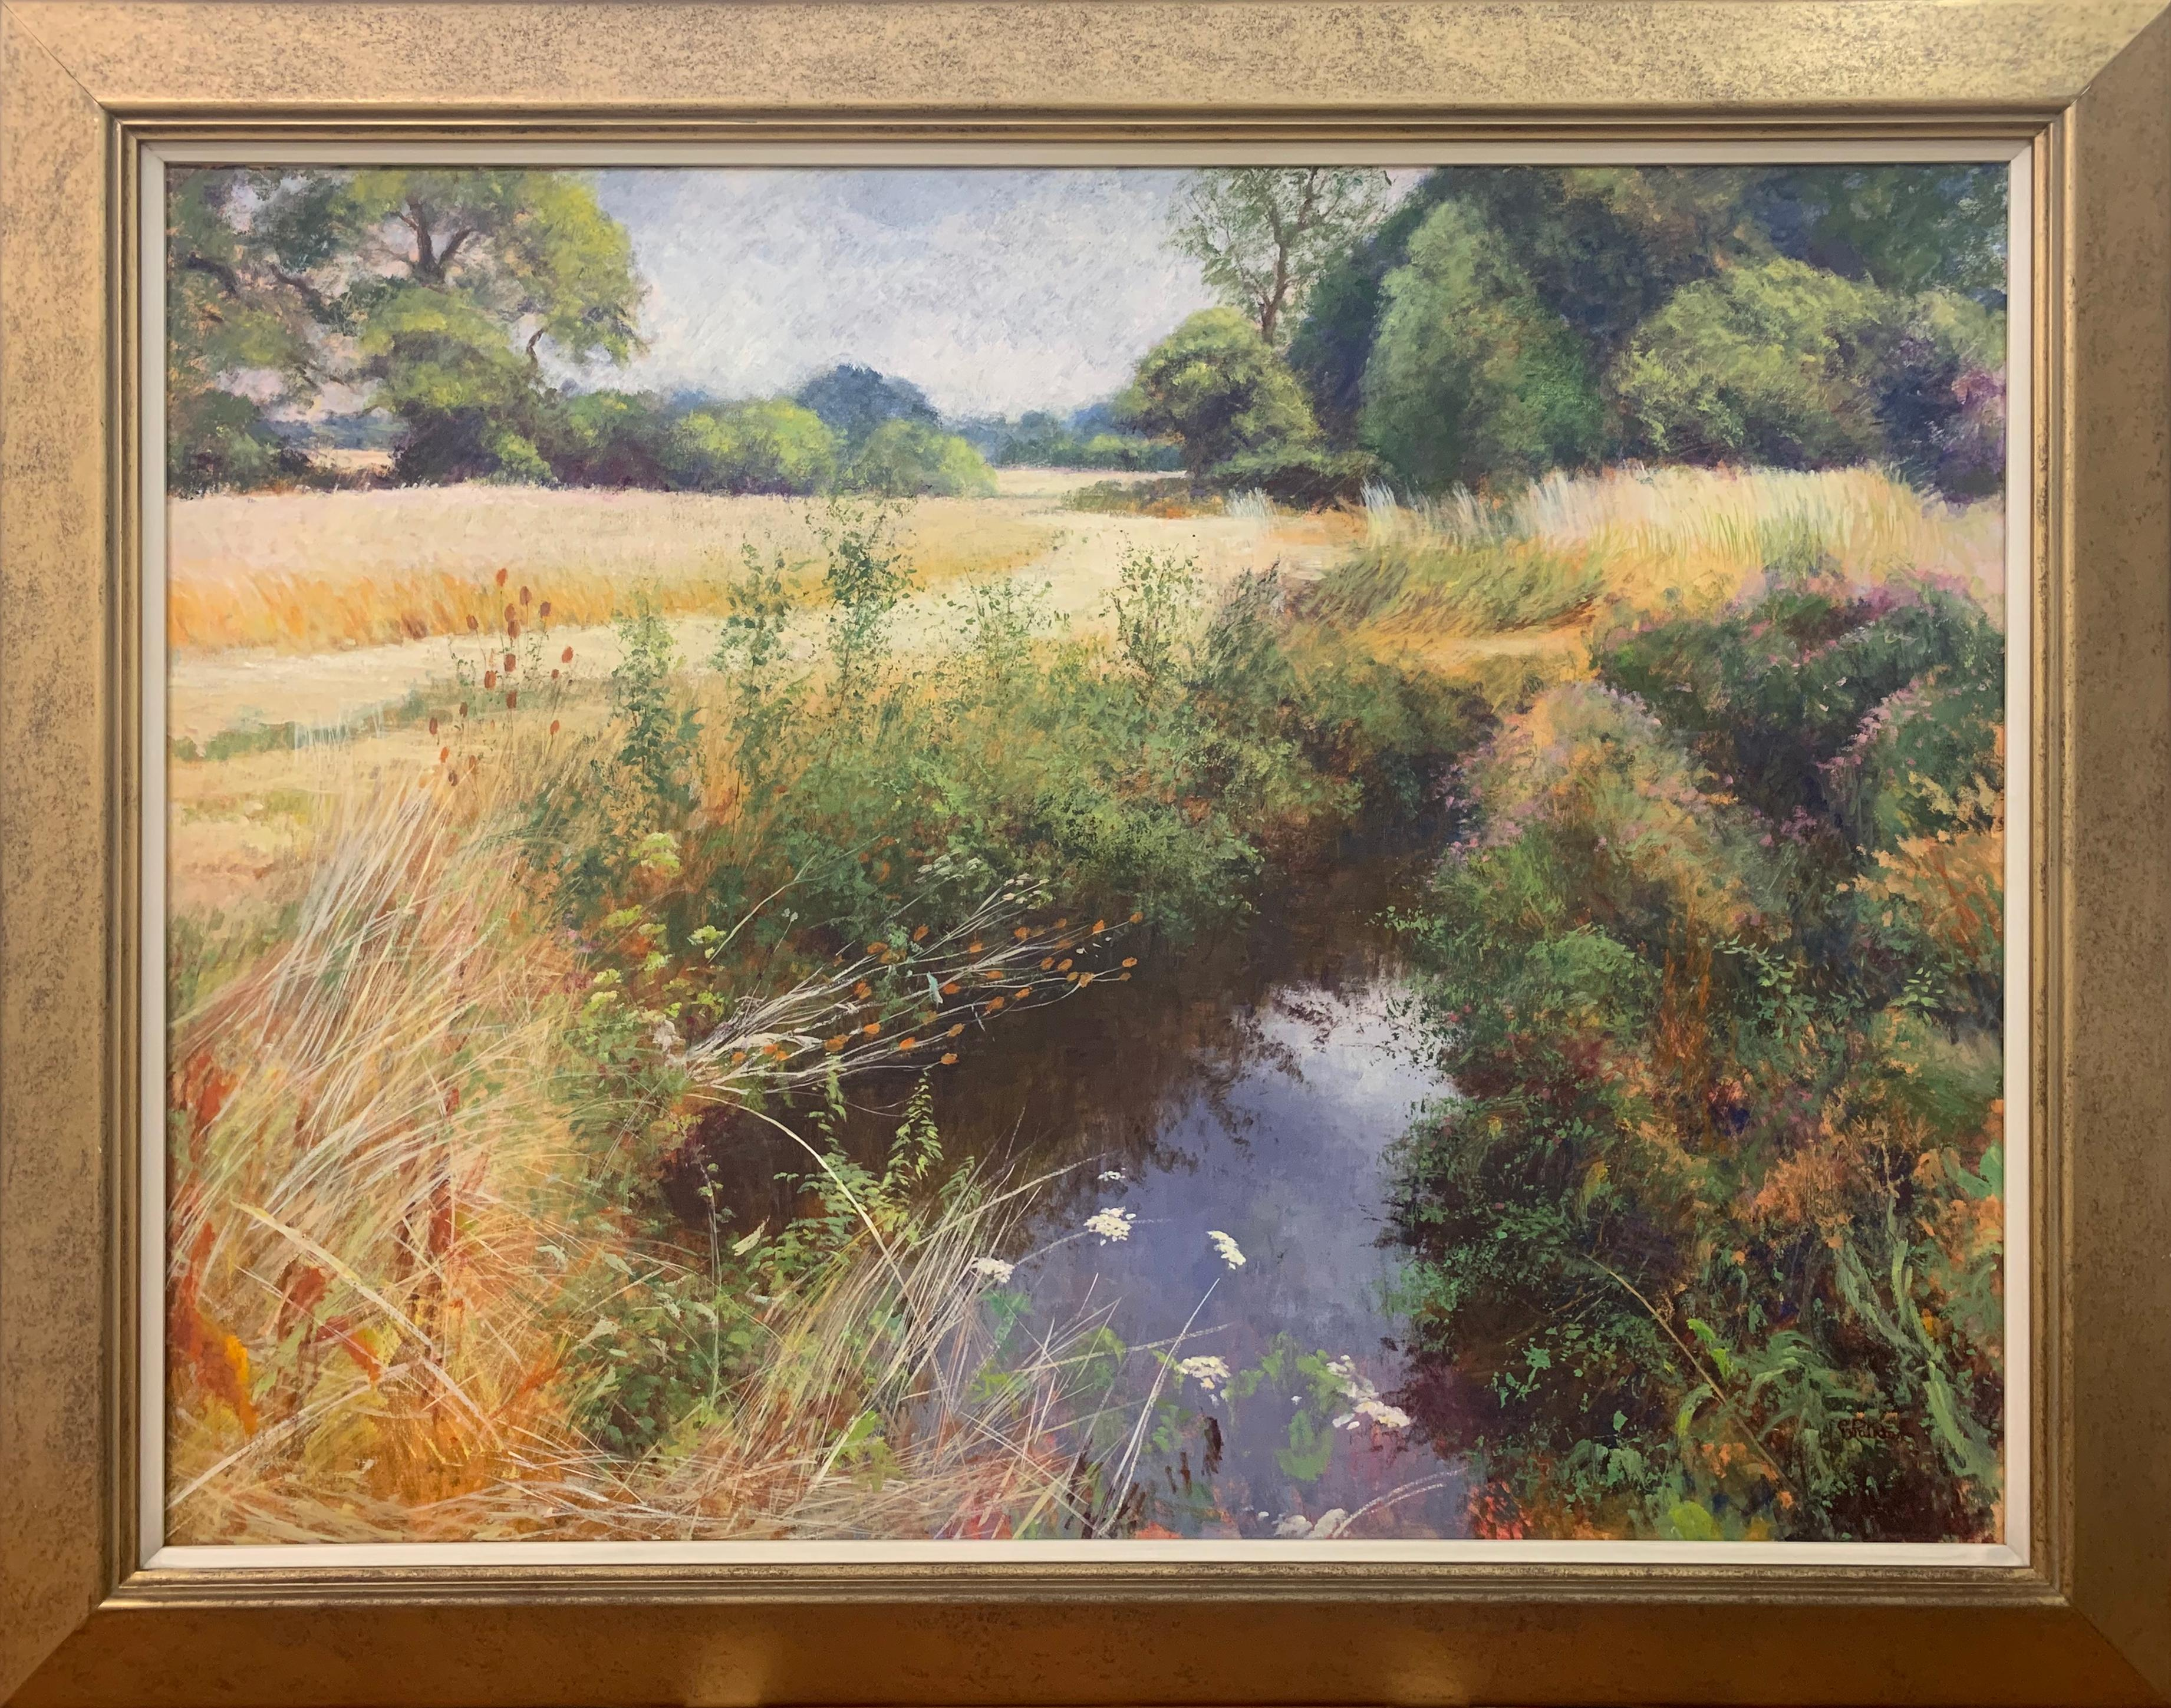 English High Summer Riverbank Landscape Original Oil Painting by British Artist